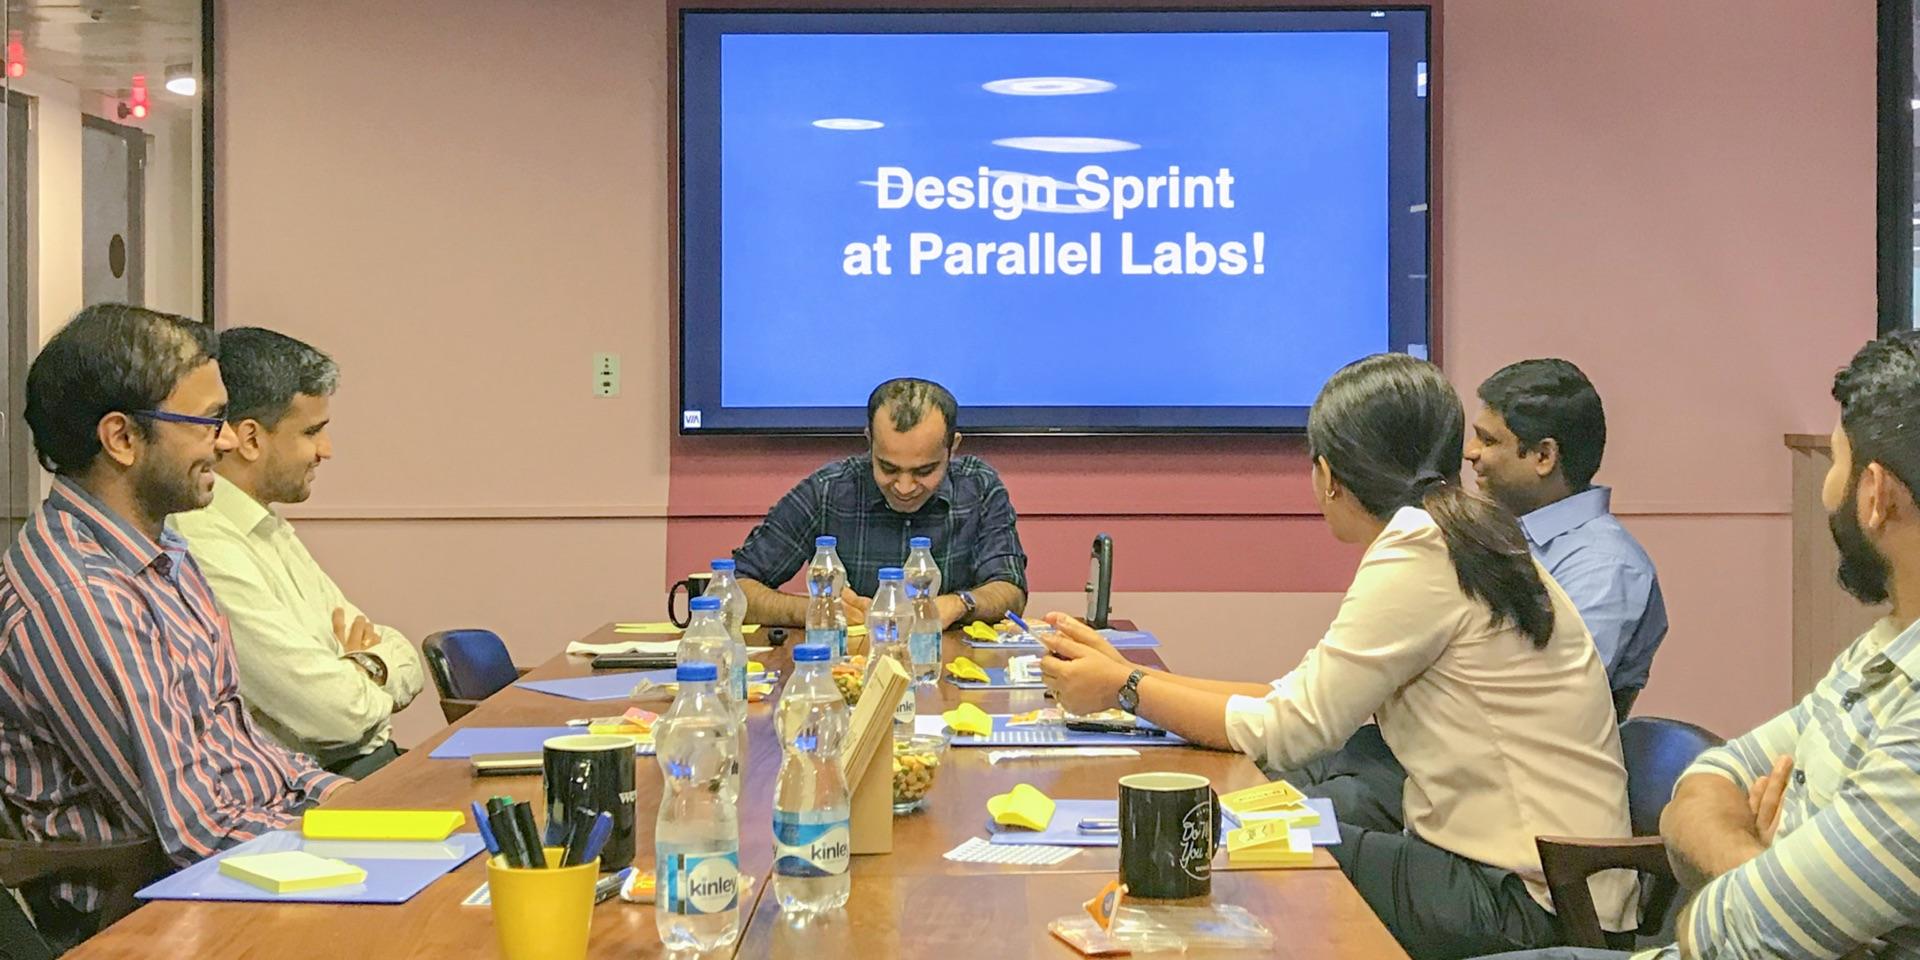 Equifax design sprint team orientation at parallel labs